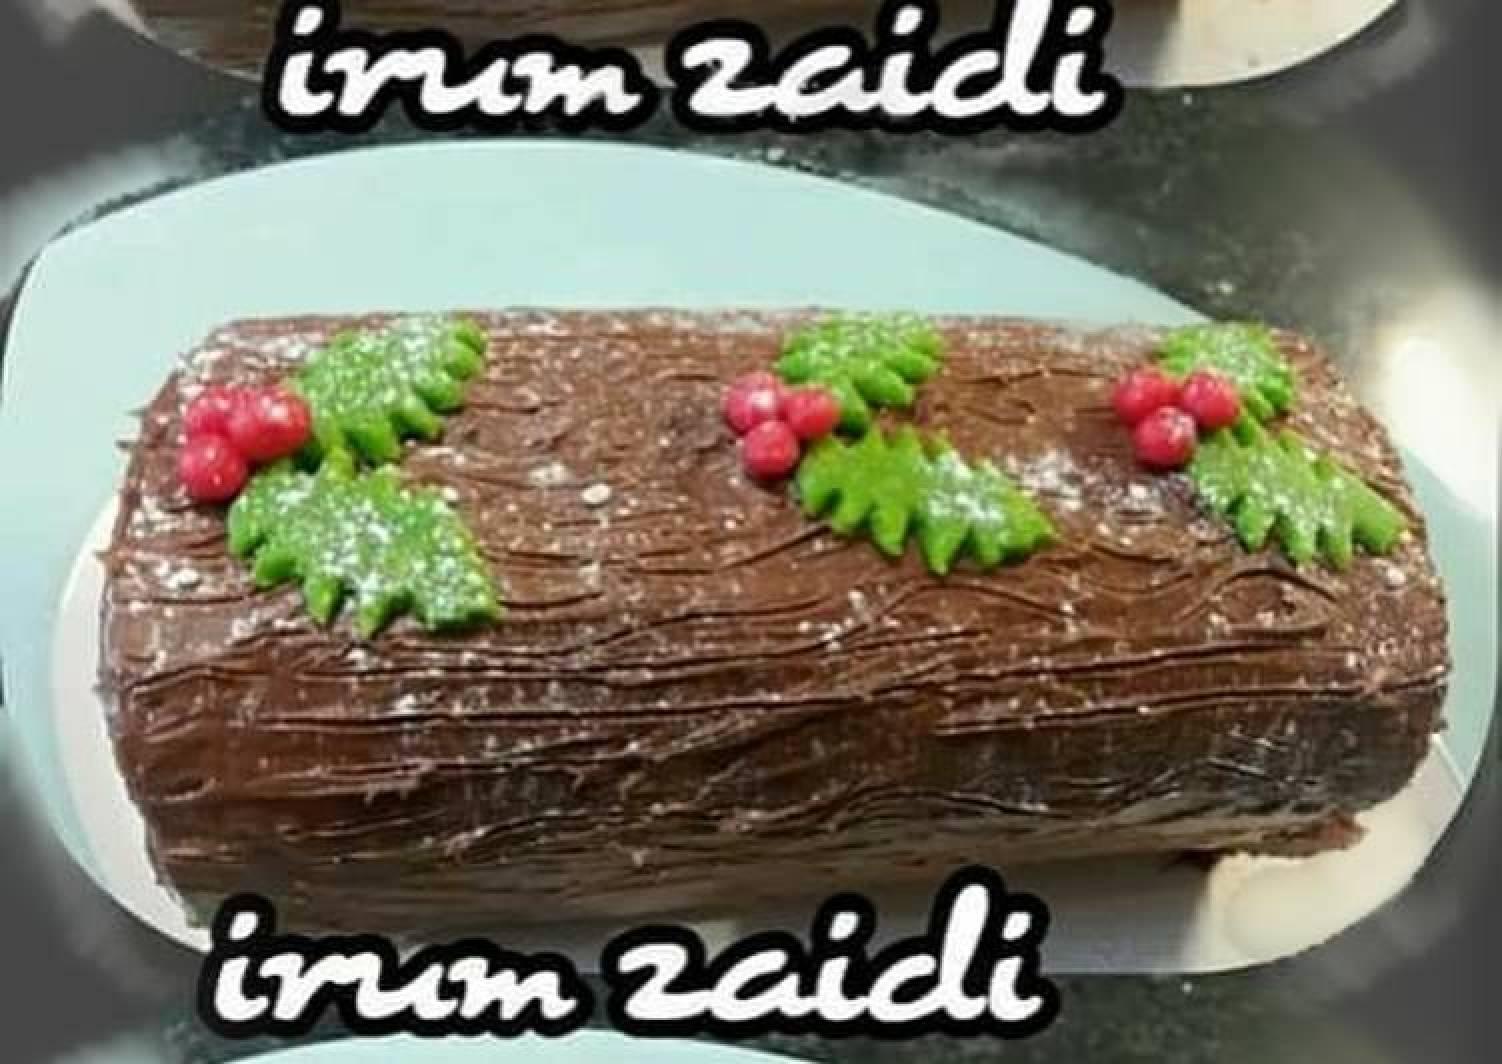 🎄❄⛄🍩🎂🍫Yule Log or chocolate log 🍫🎂🍩 ⛄❄🎄